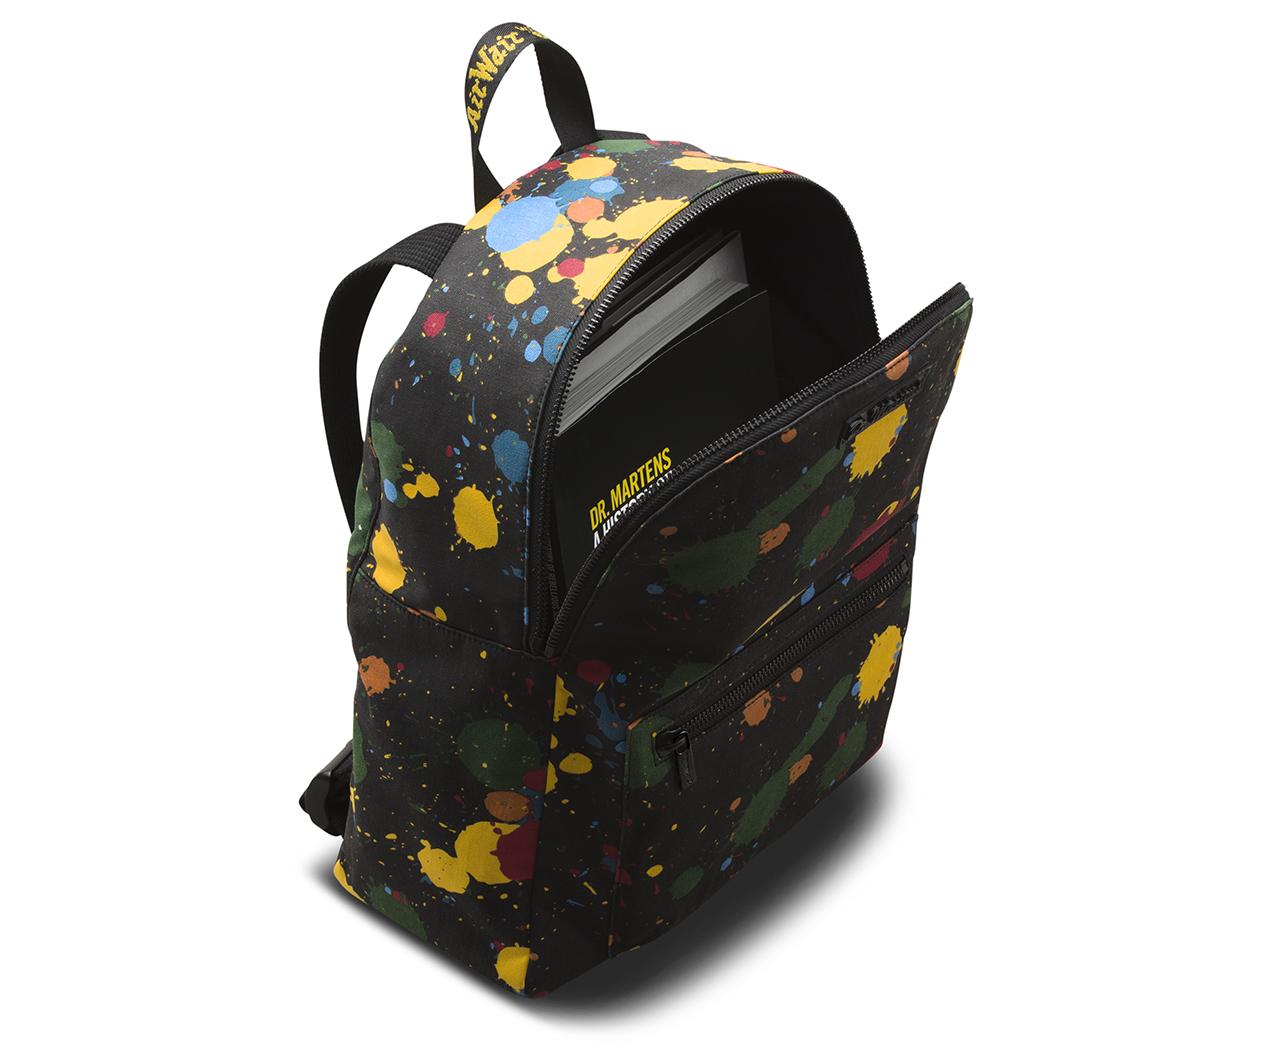 Fabric Canvas Backpack   Bags & Satchels   Official Dr. Martens Store - EU